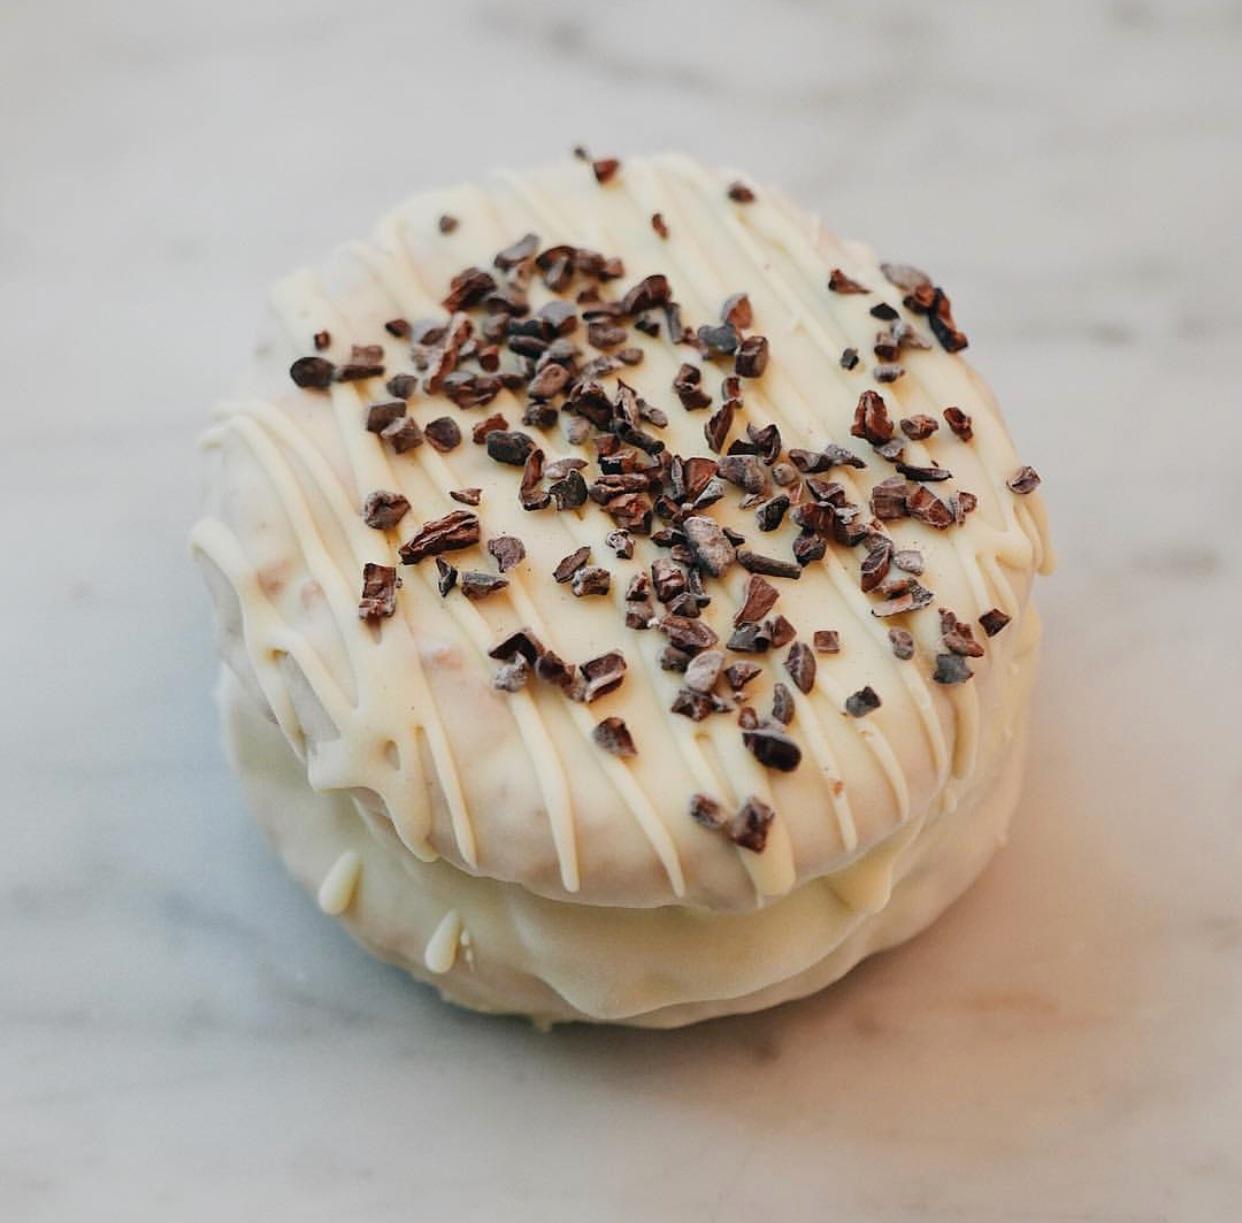 COFFEE - COFFEE COCOA NIB WHITE CHOCOLATE ICE CREAMDOUBLE CHOCOLATE CHIP COOKIESDIPPED IN WHITE CHOCOLATECOCOA NIB TOPPING